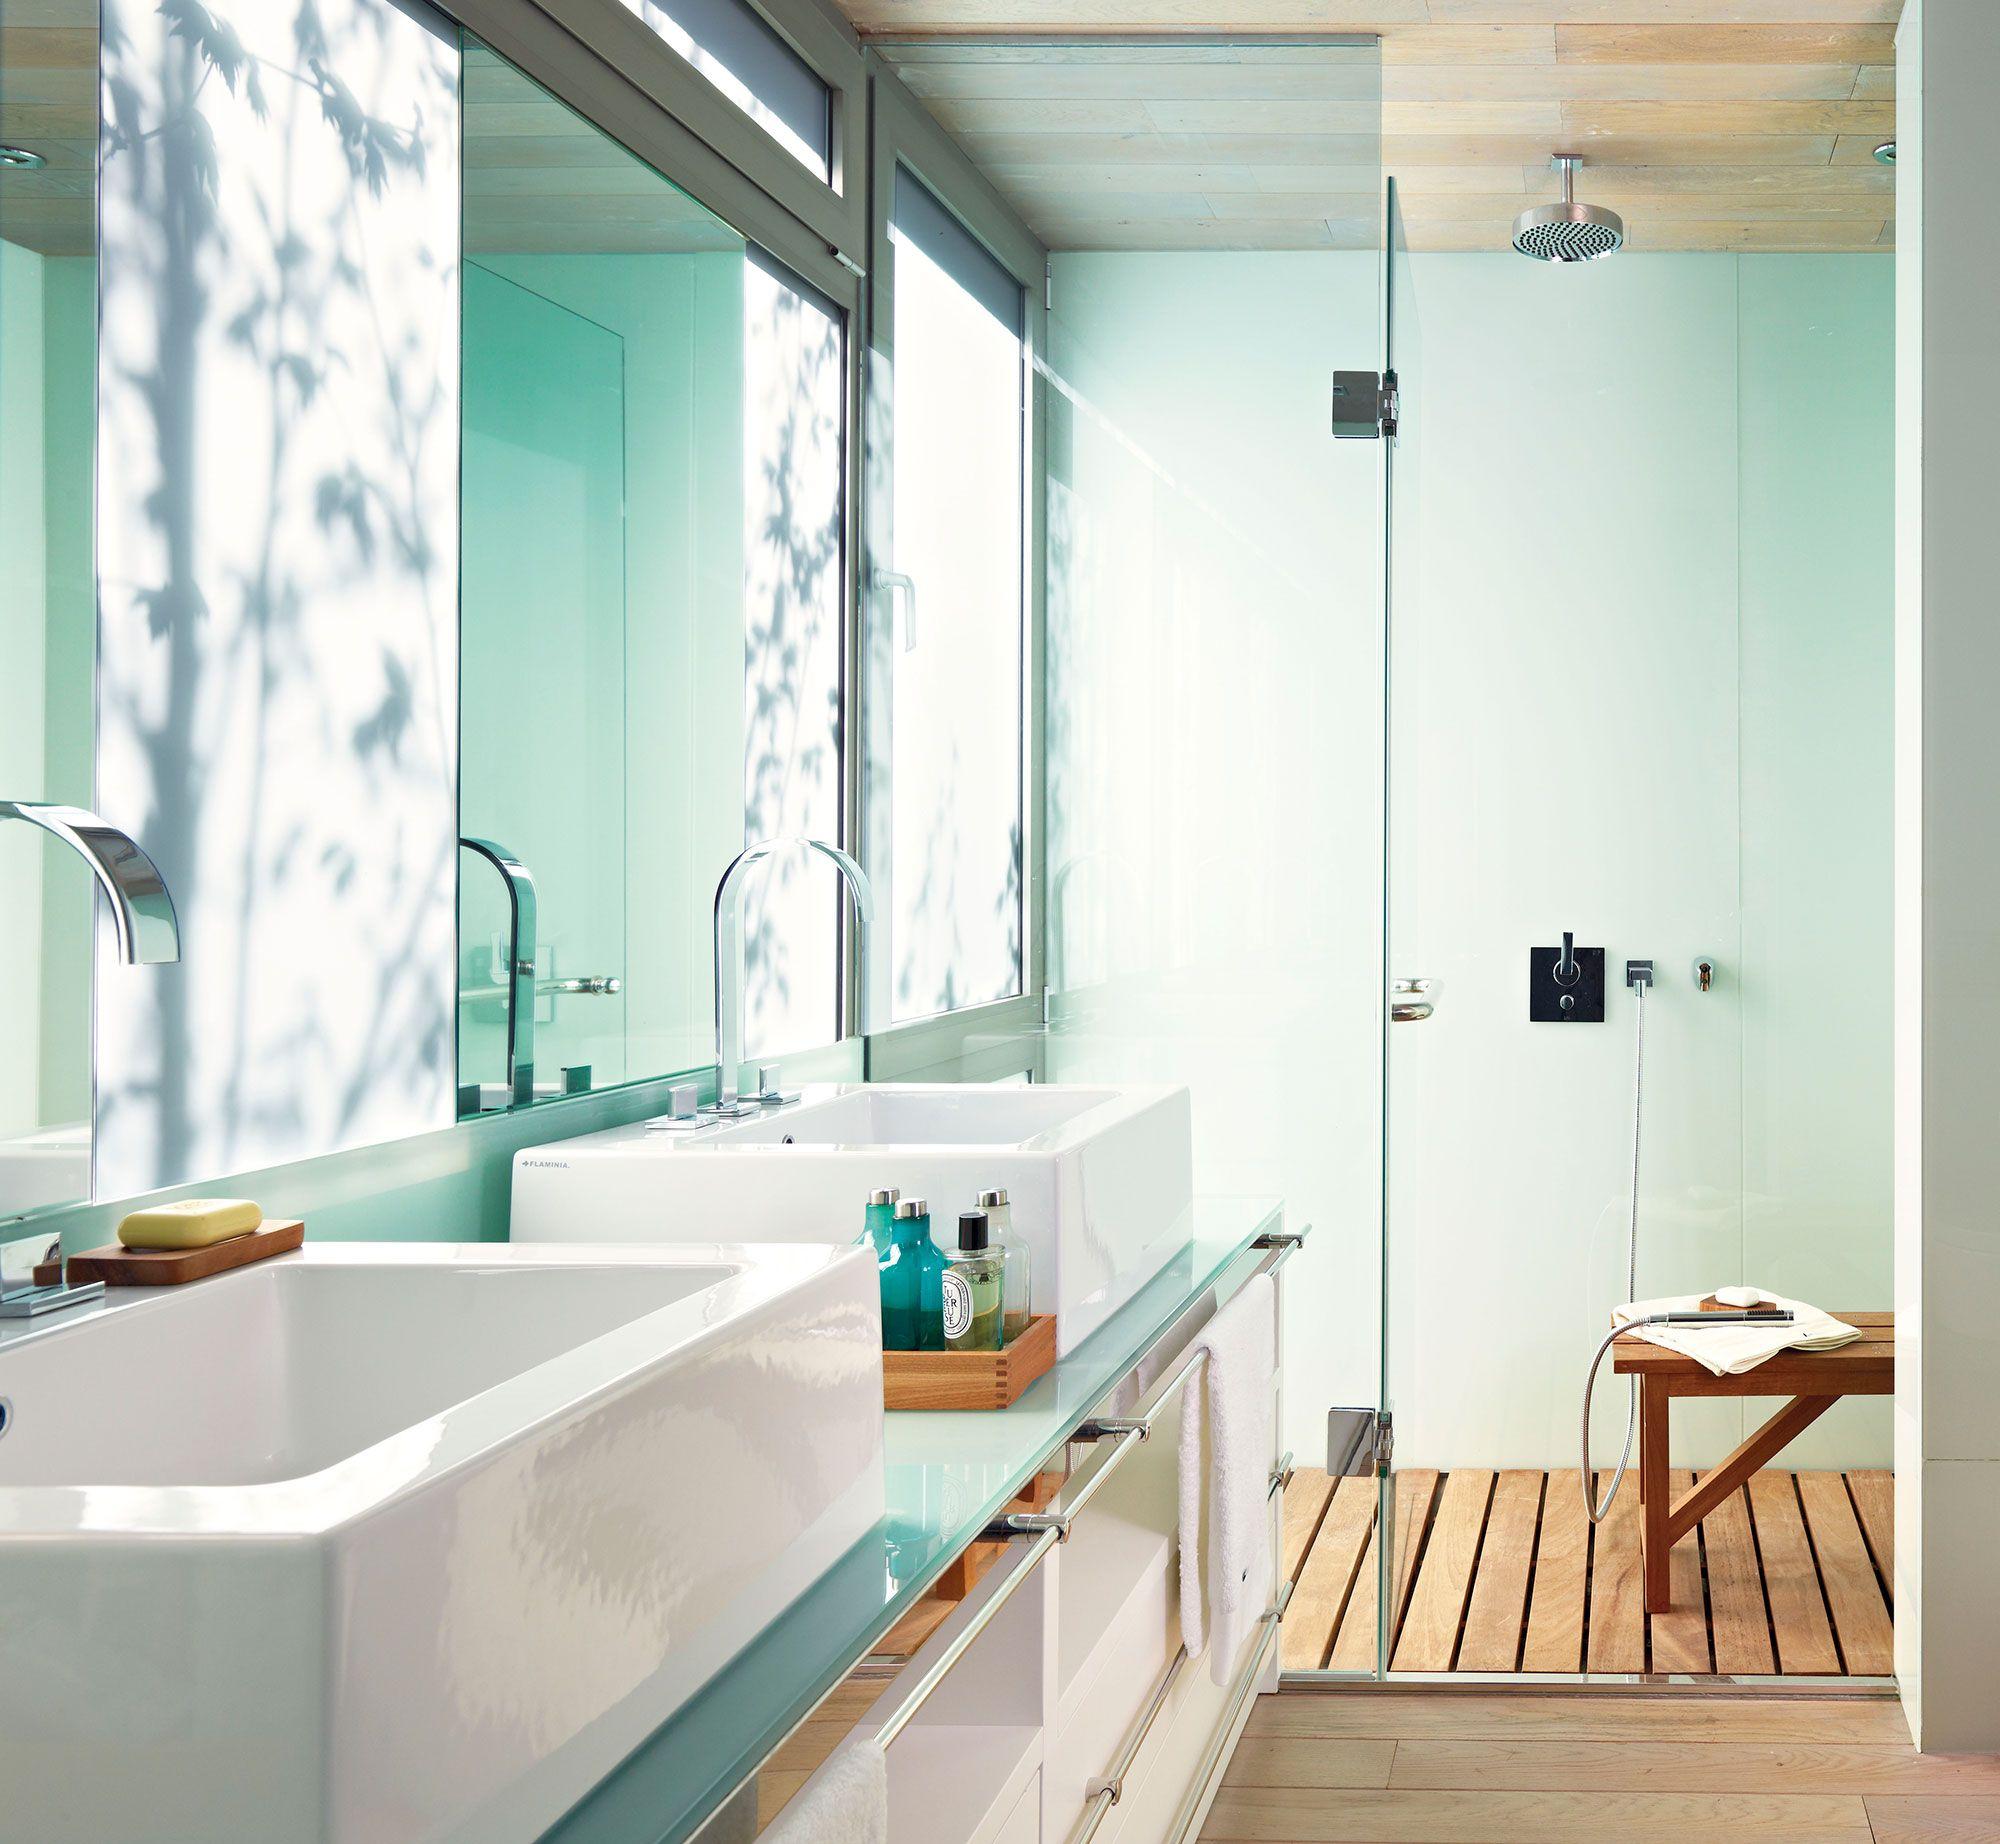 C mo limpiar la puerta de vidrio de una ducha como decirle puertas de vidrio y duchas - Como limpiar la mampara de la ducha ...